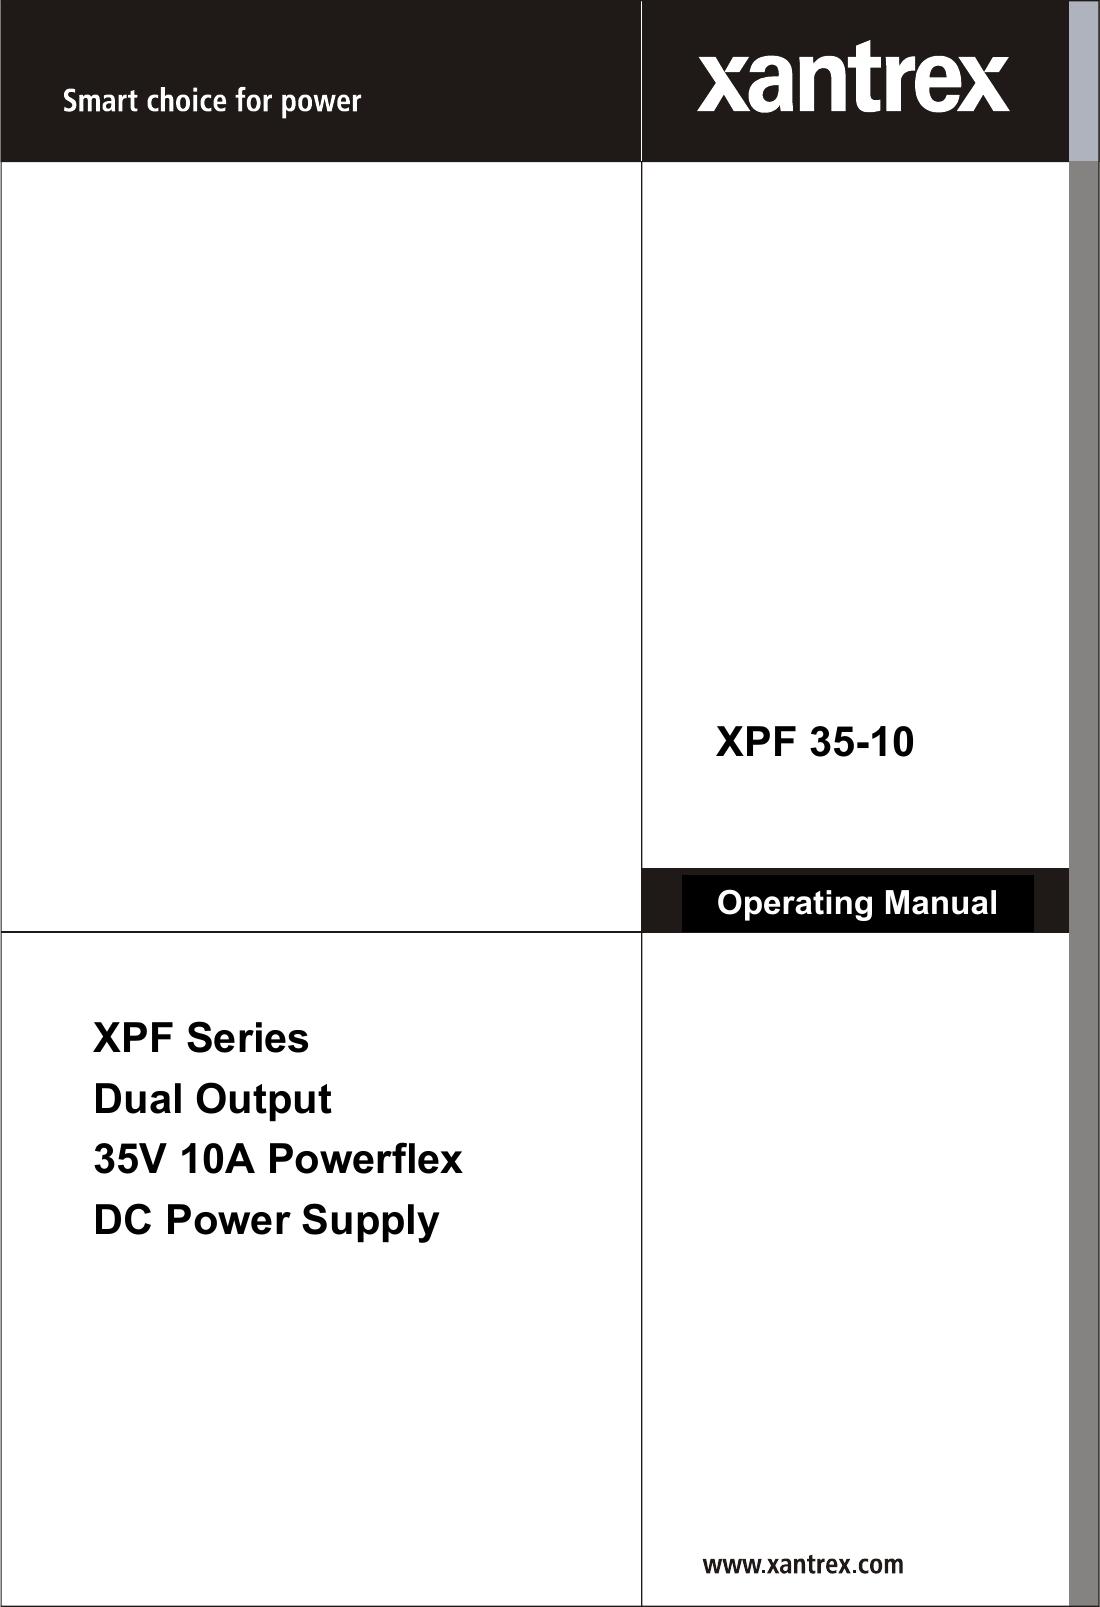 Xantrex Xpf 35 10 Users Manual